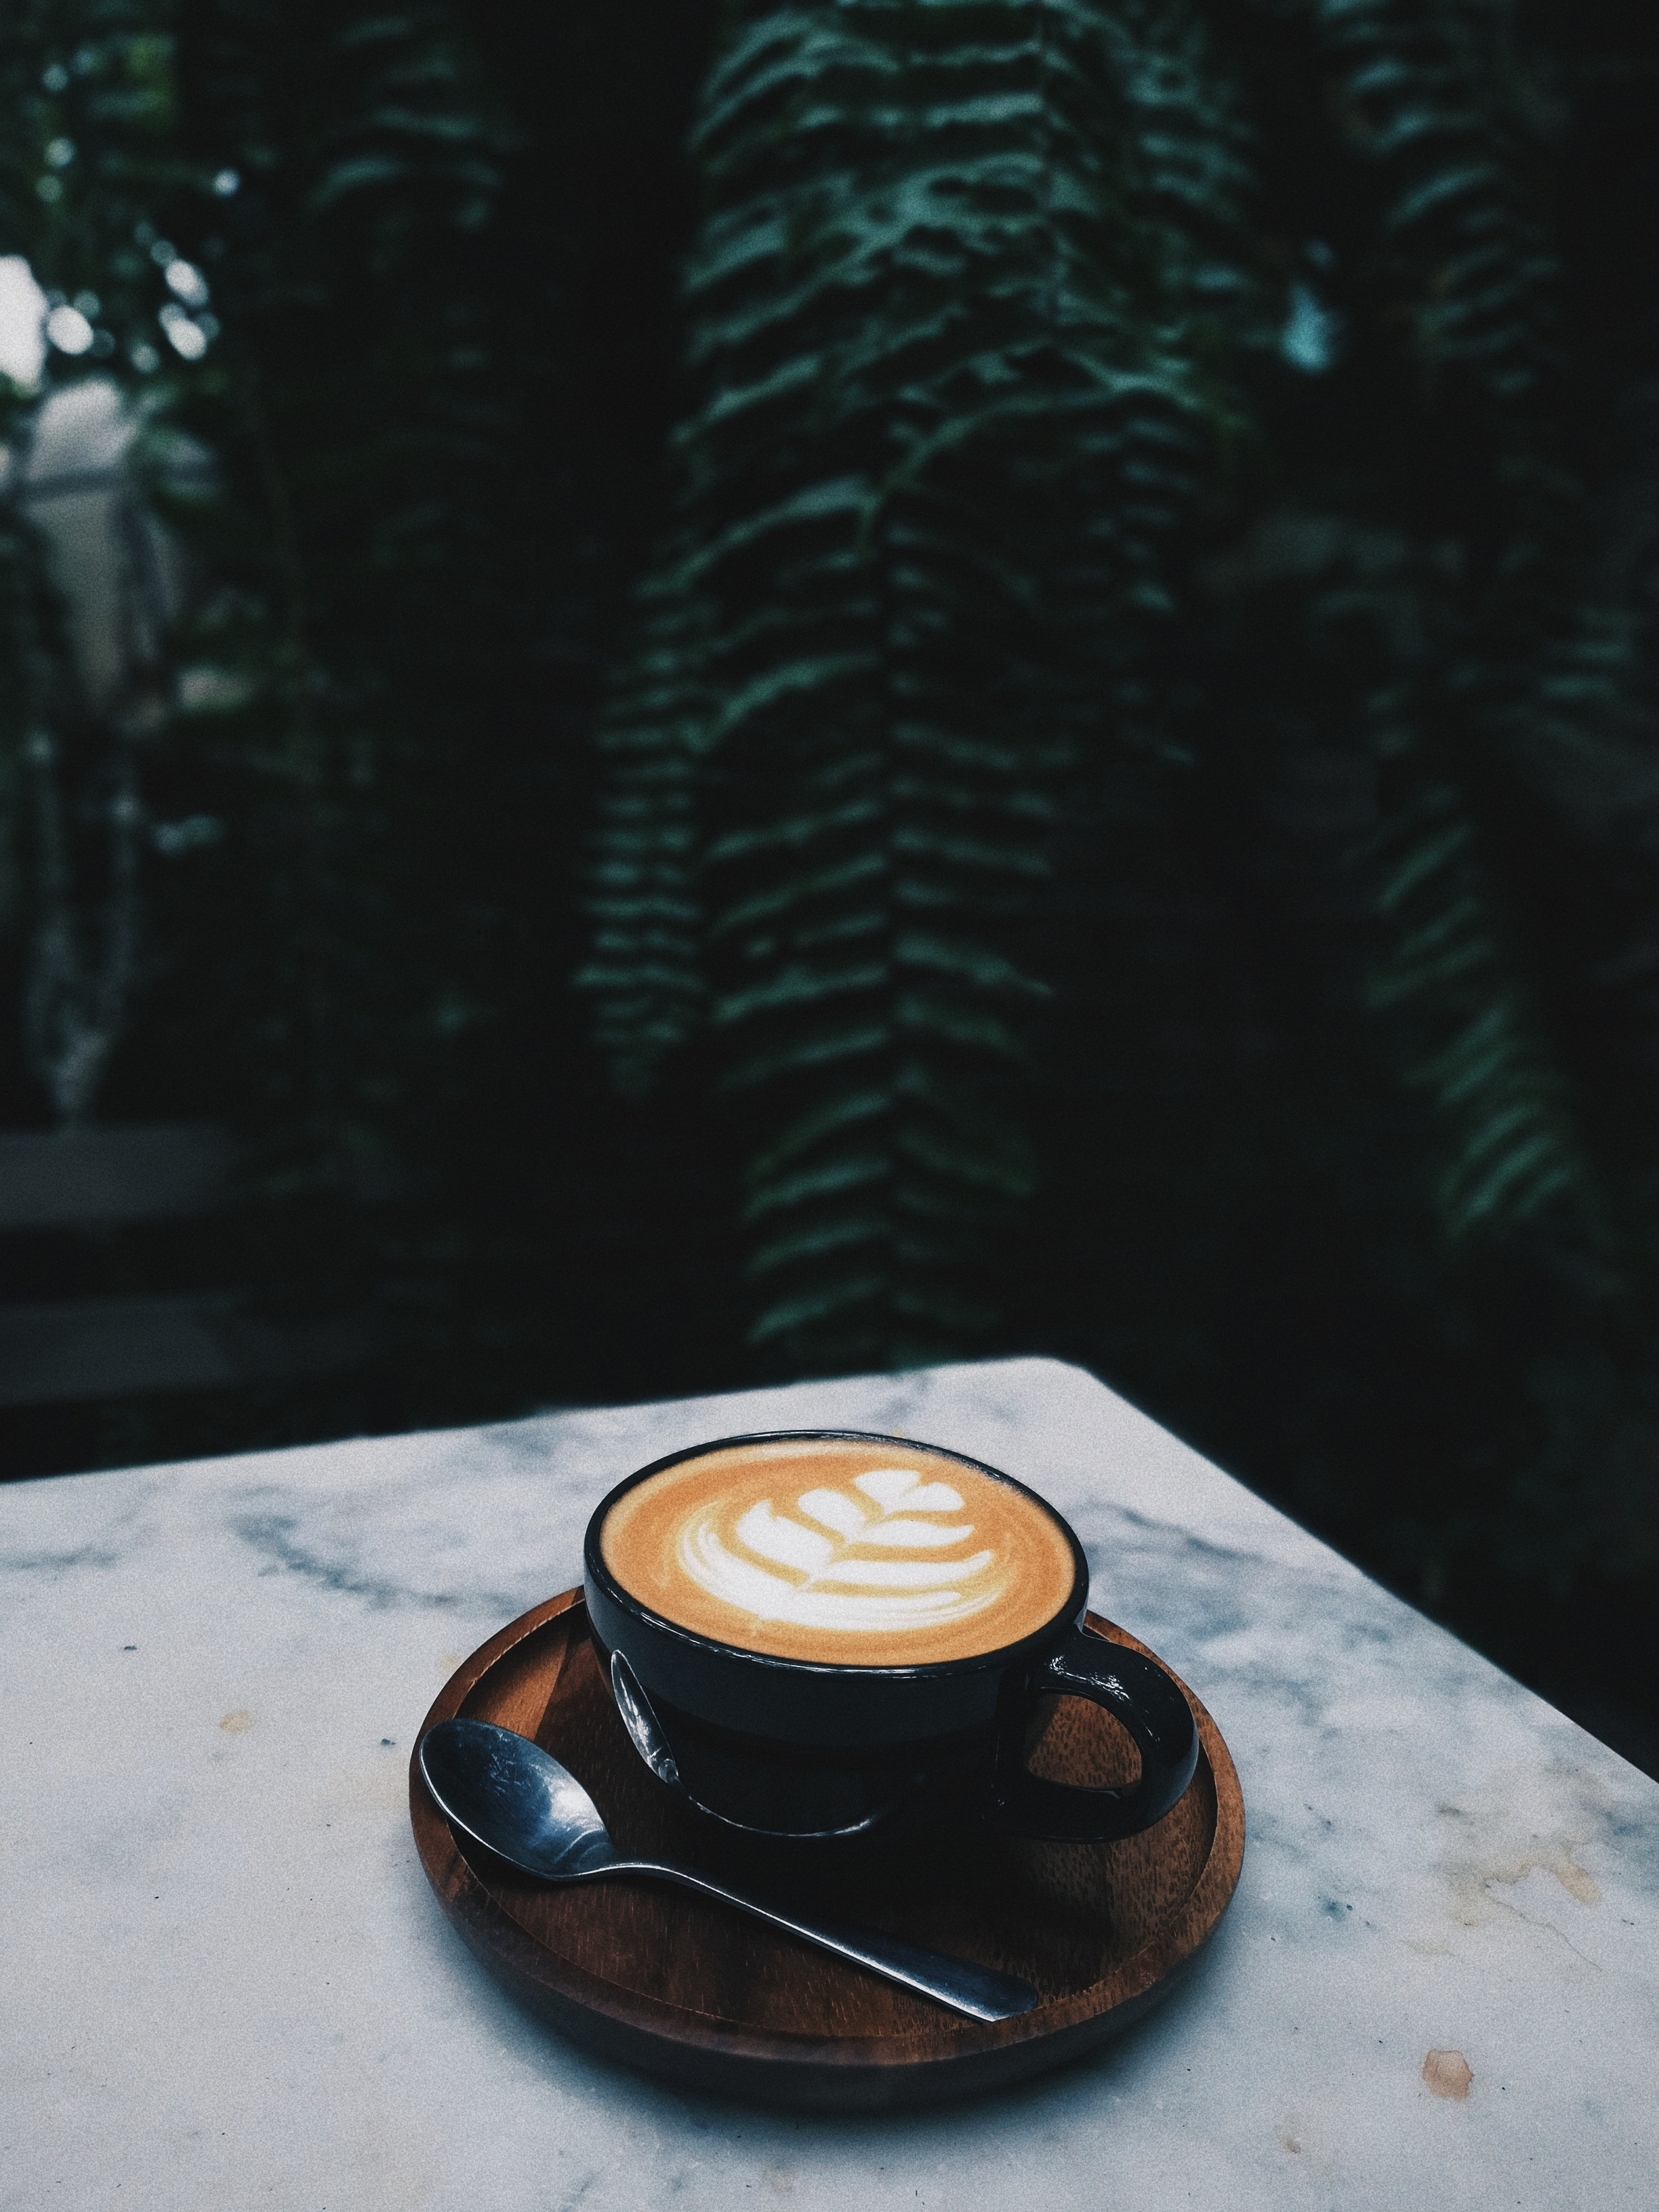 A coffee shop in Detroit